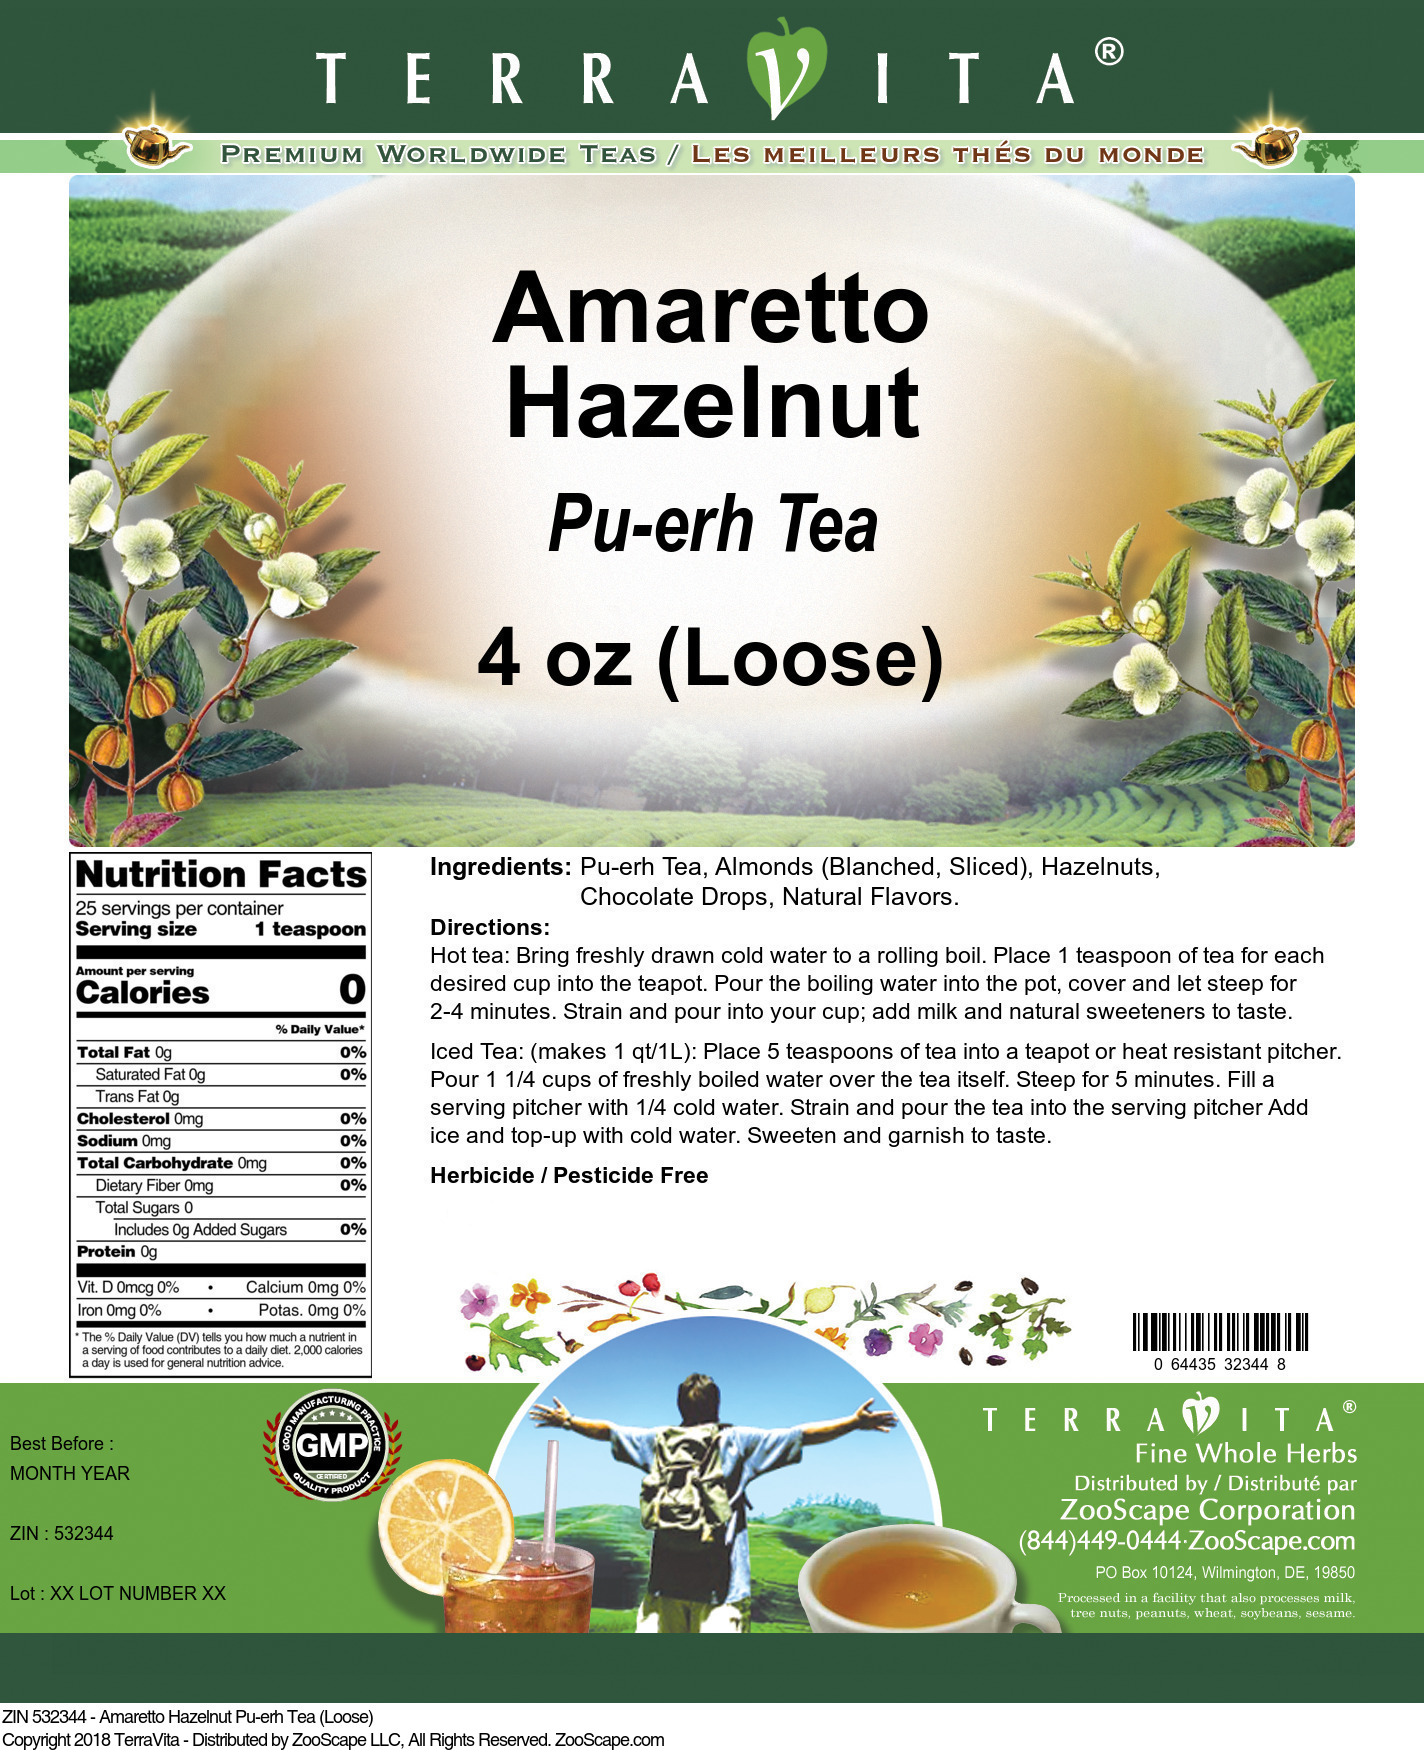 Amaretto Hazelnut Pu-erh Tea